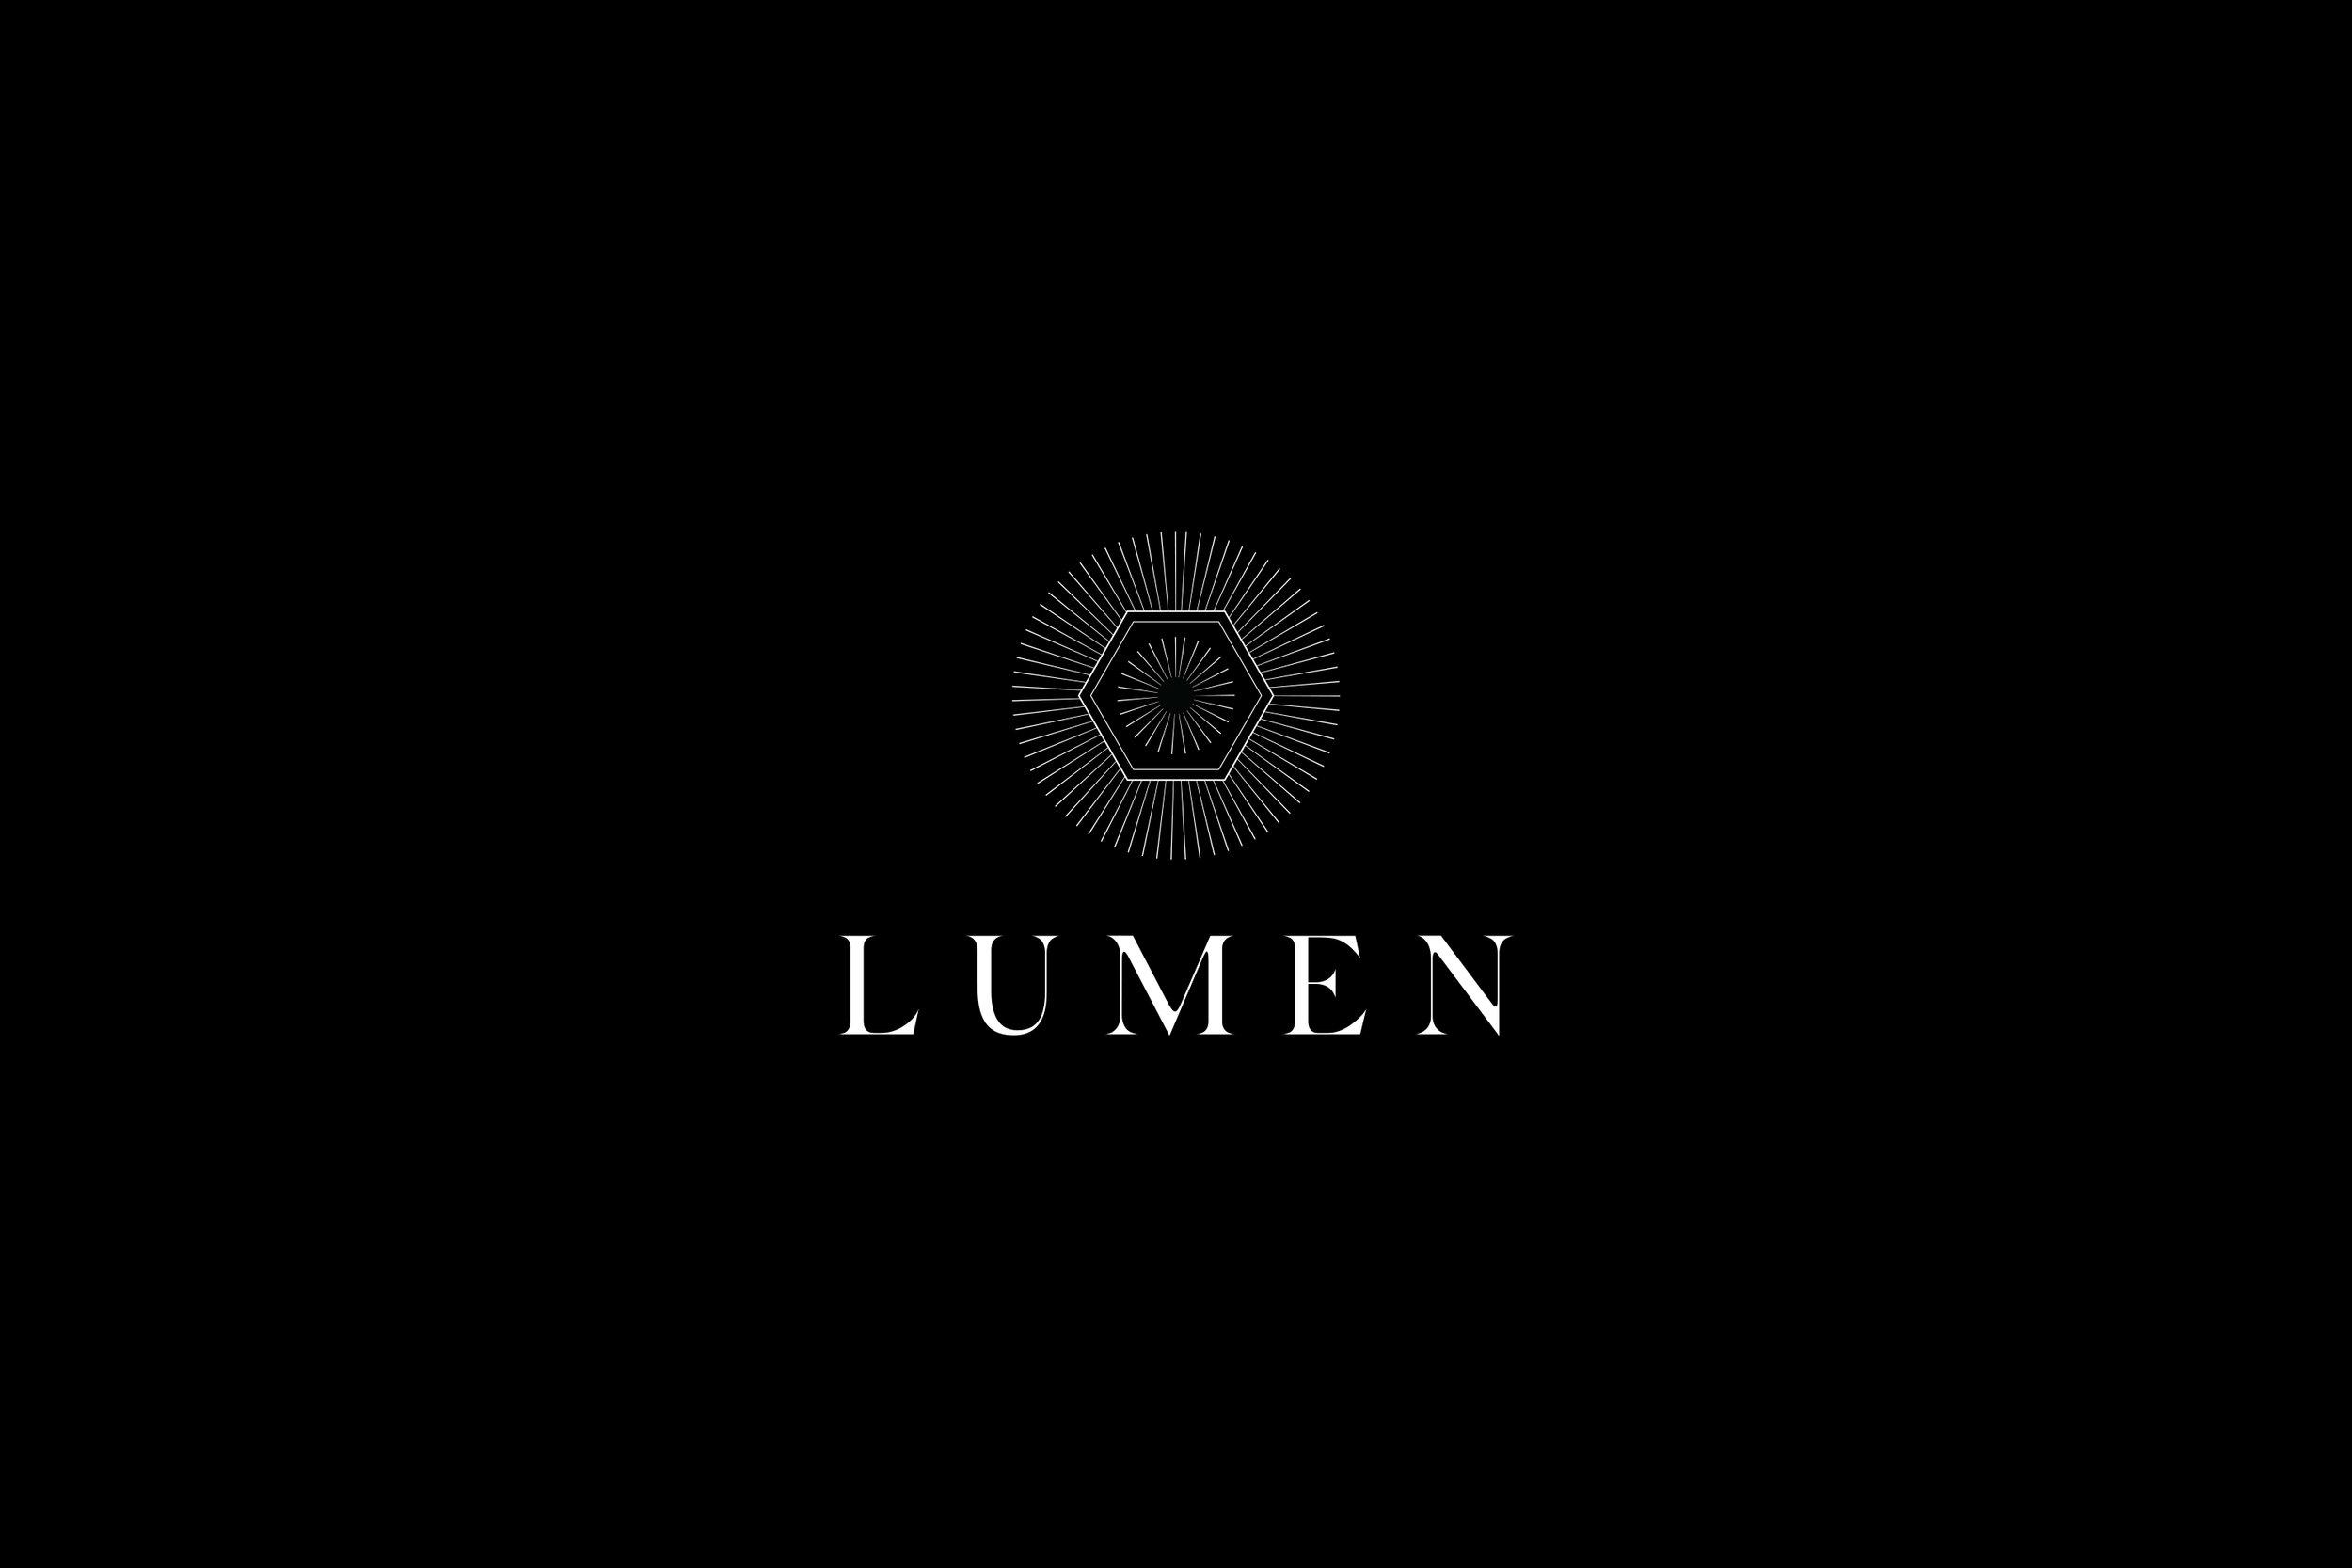 Lumen_Logo.jpg